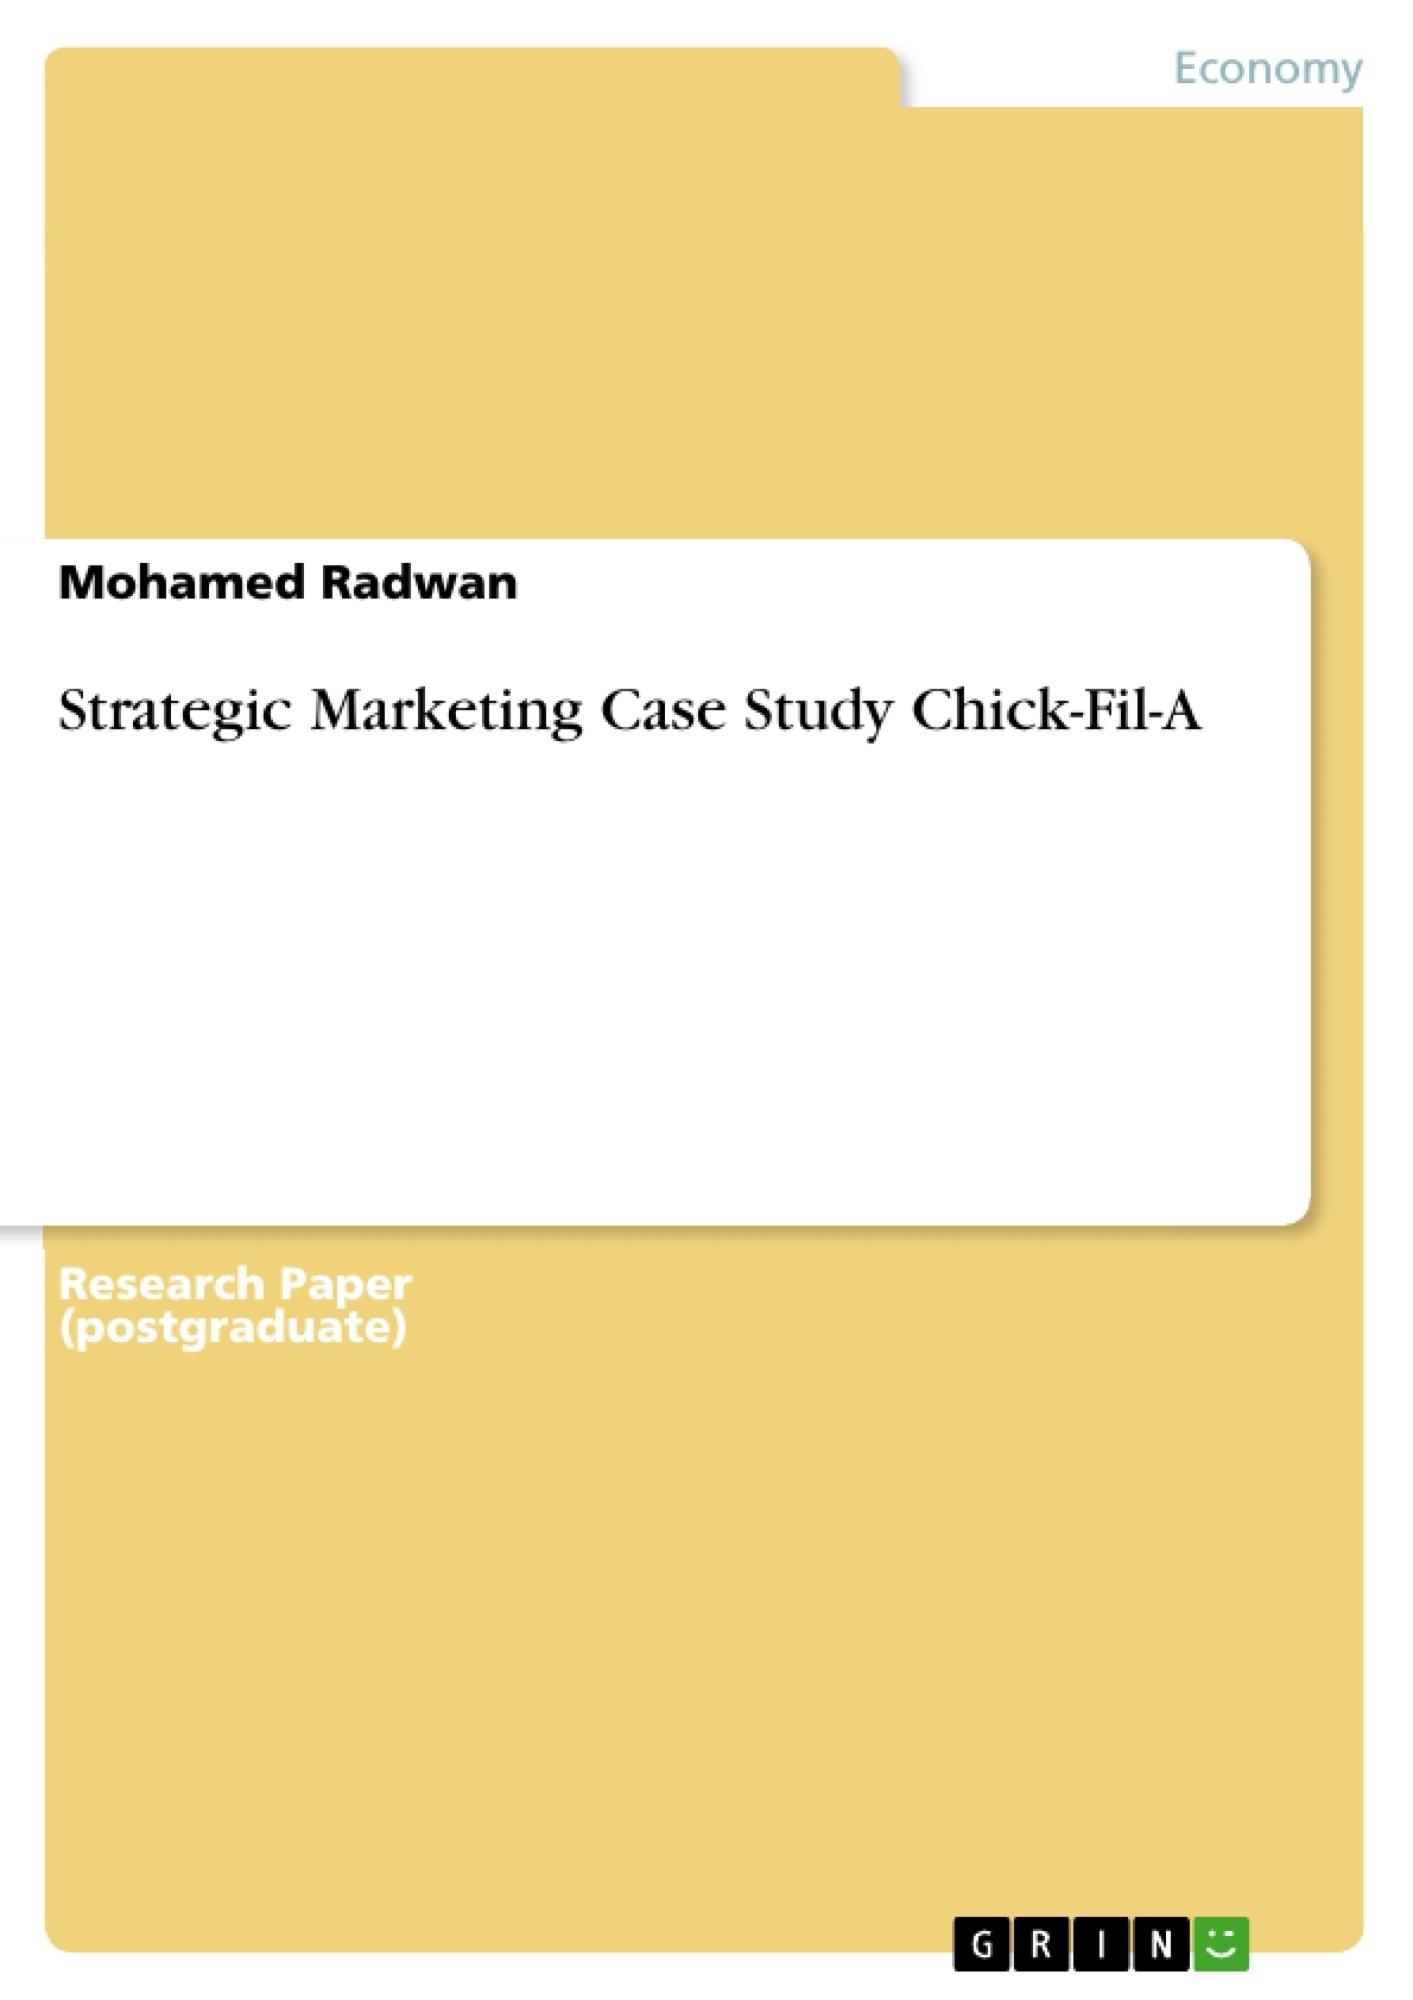 GRIN - Strategic Marketing Case Study Chick-Fil-A